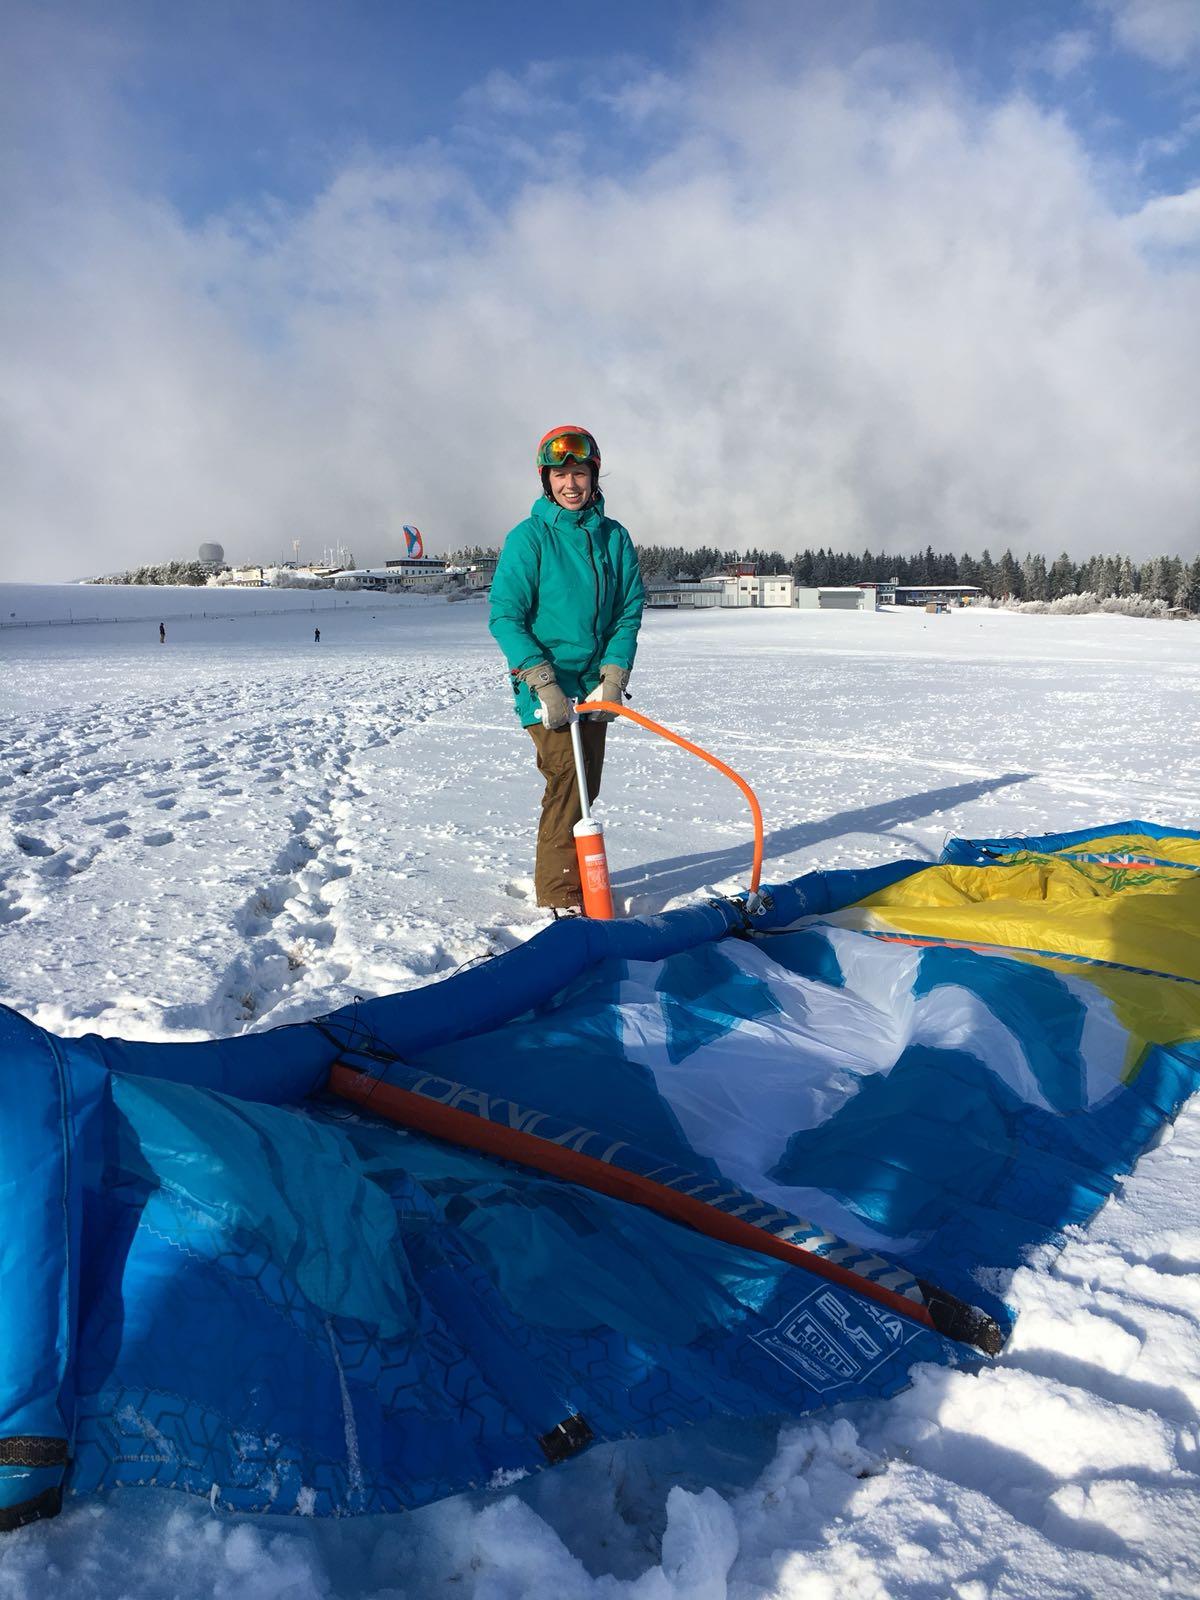 KiteFEEL-Gersfeld-snowkite